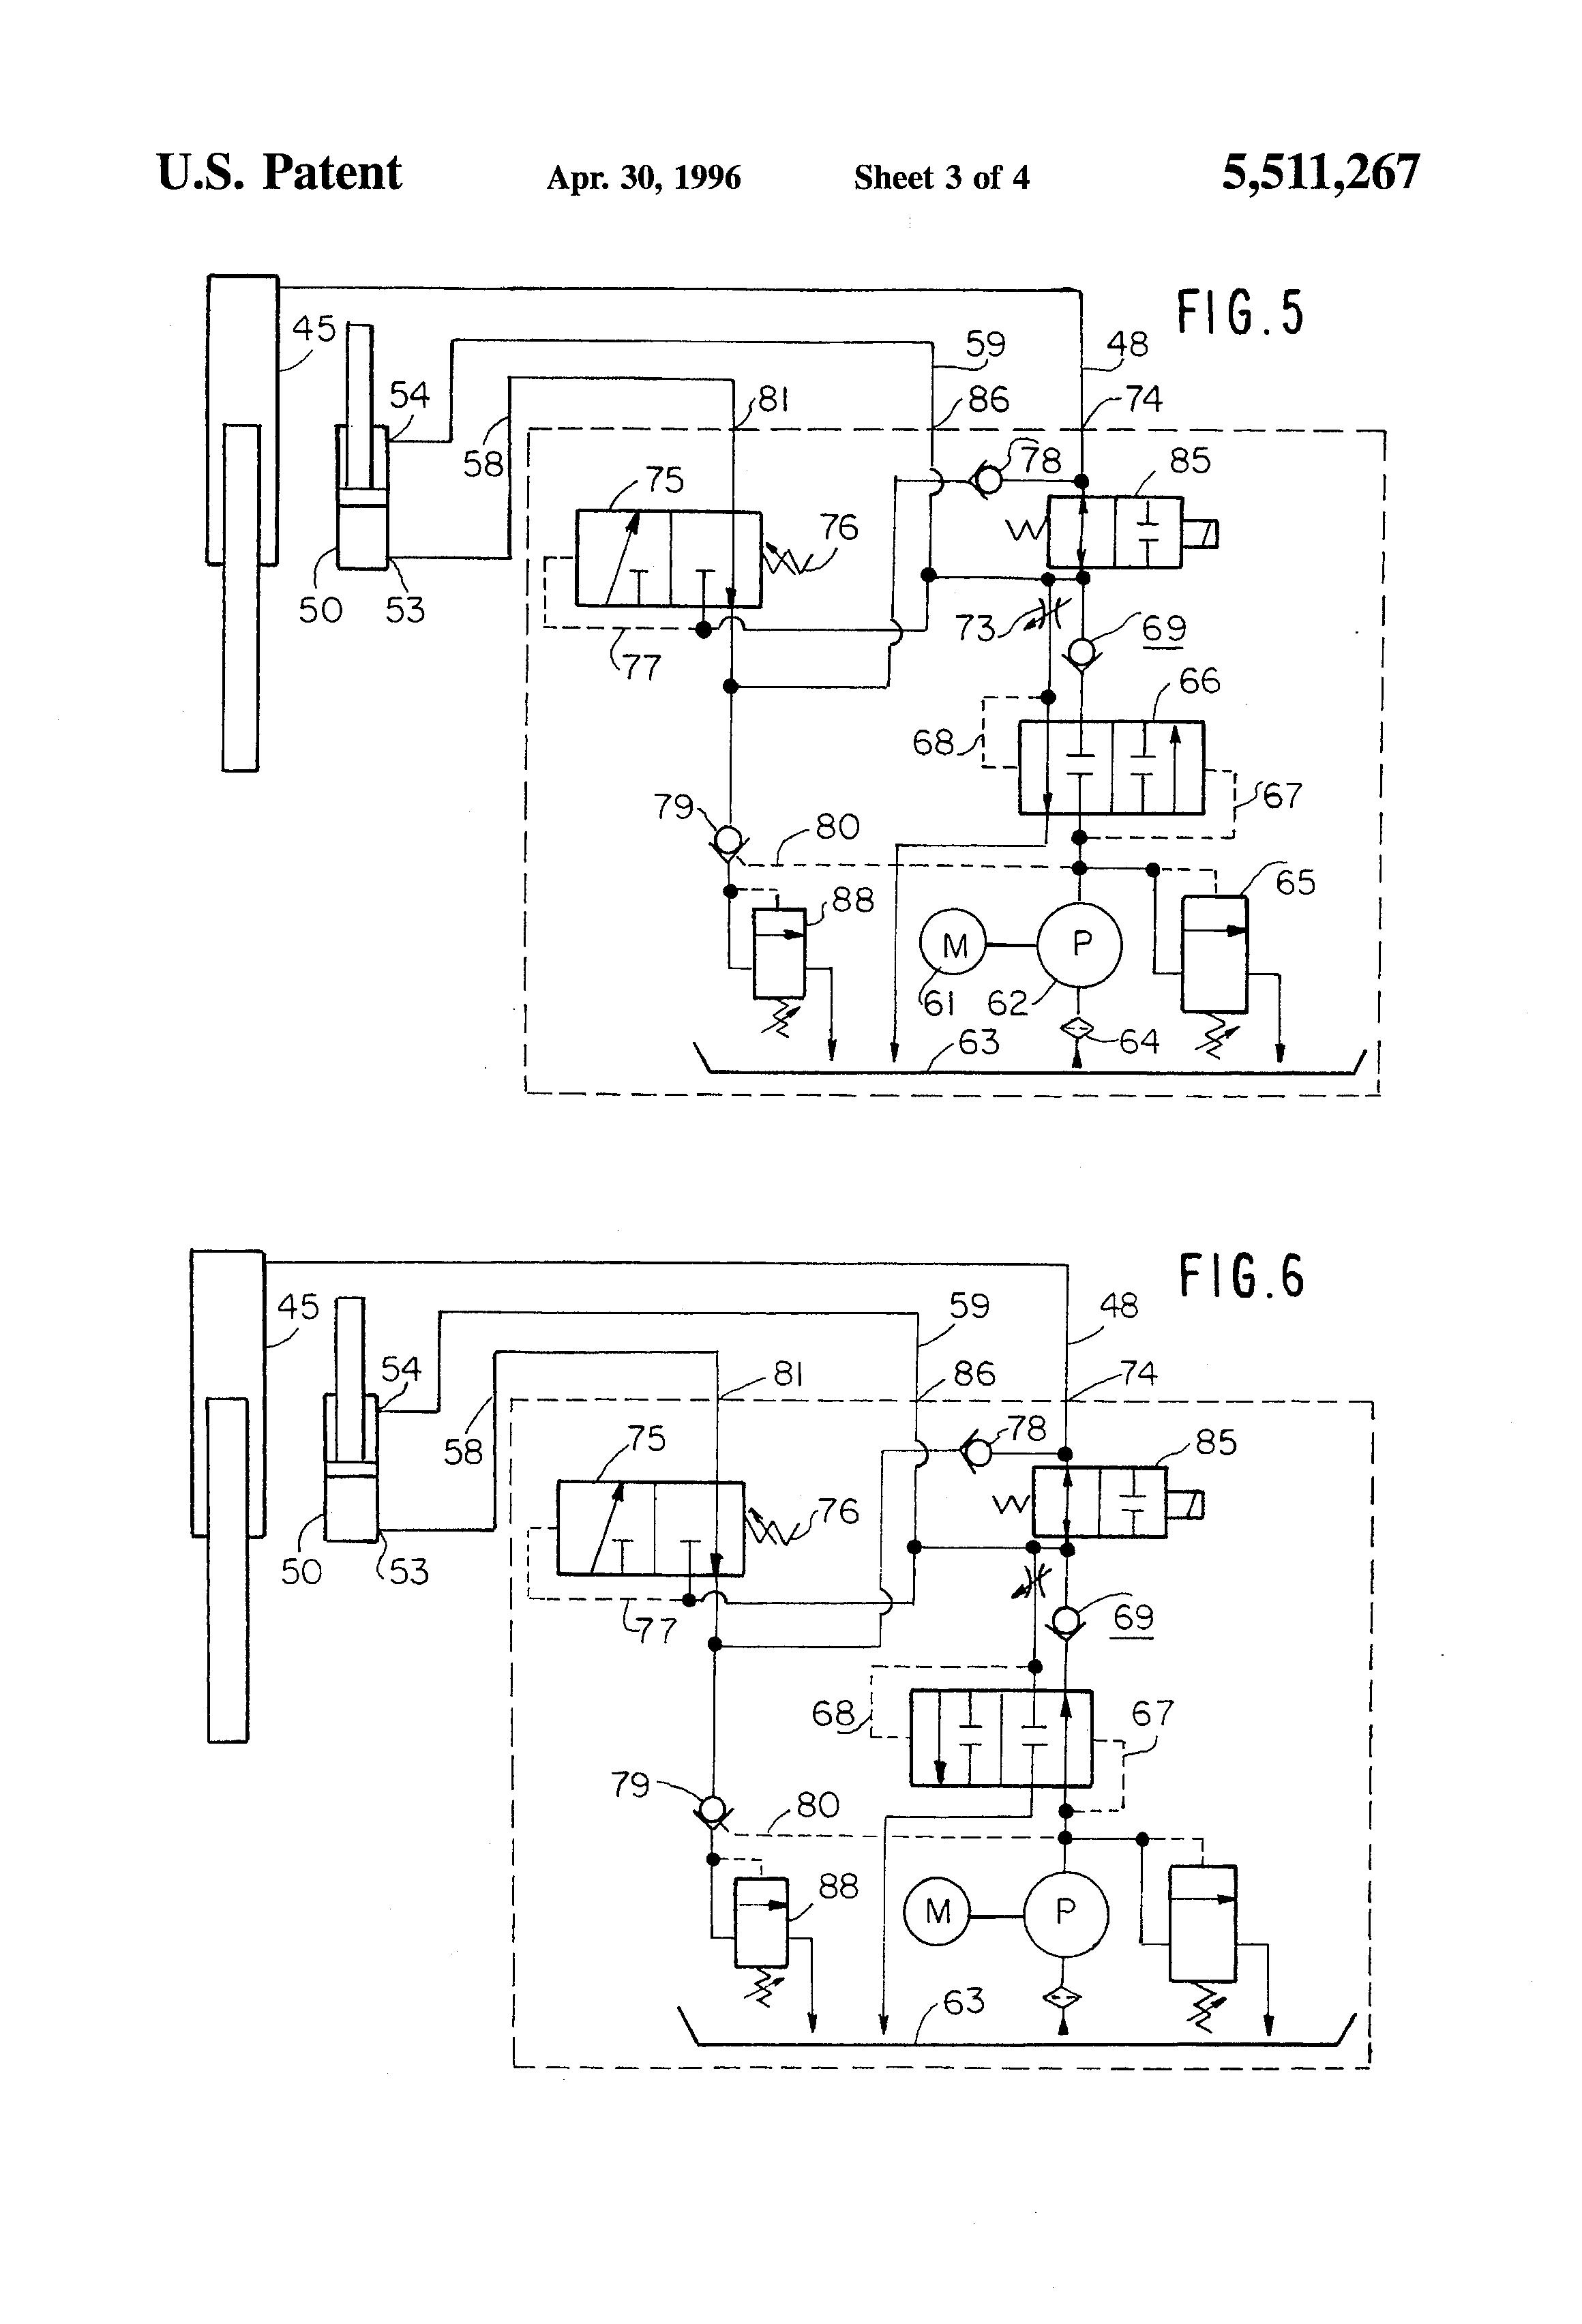 Dock Wiring Diagram | Wiring Diagram on